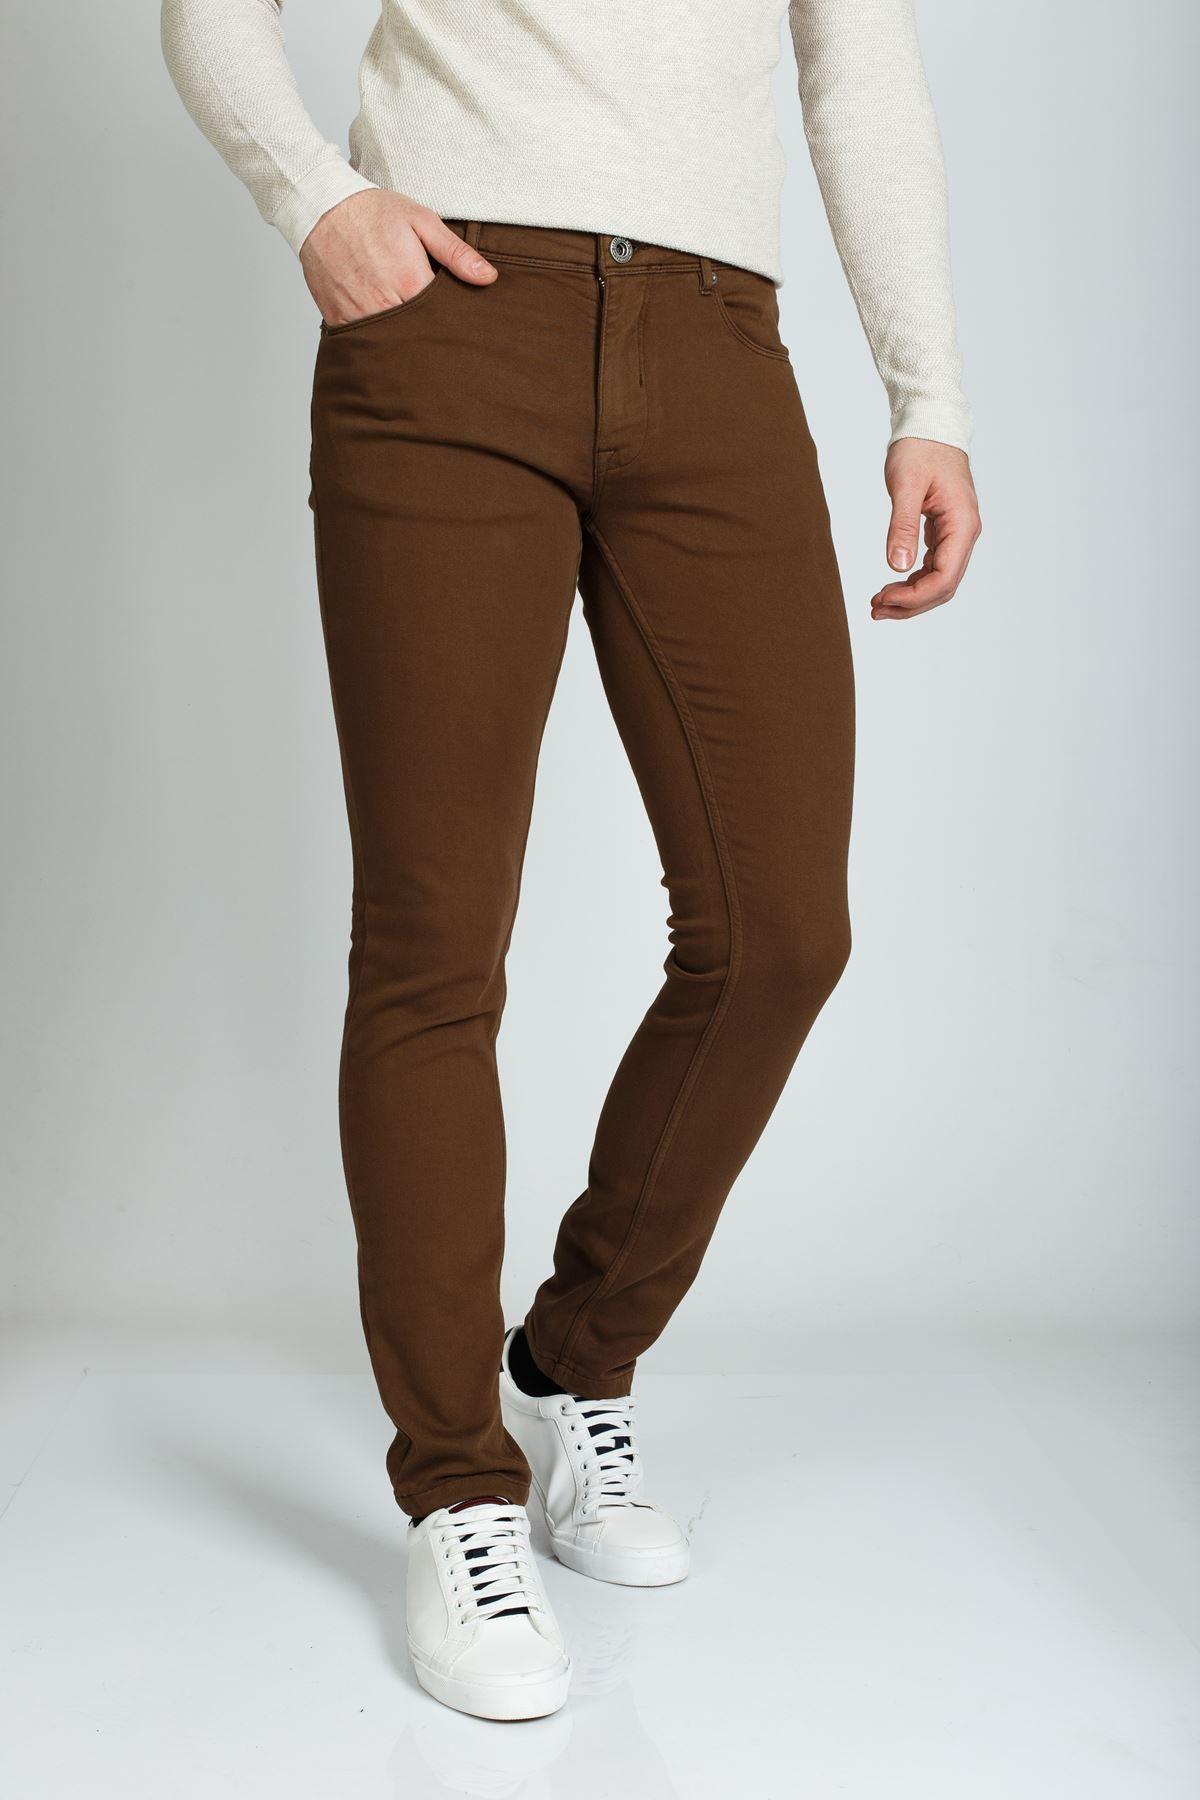 Tarçın 5 Cep Slim Canvas Pantolon